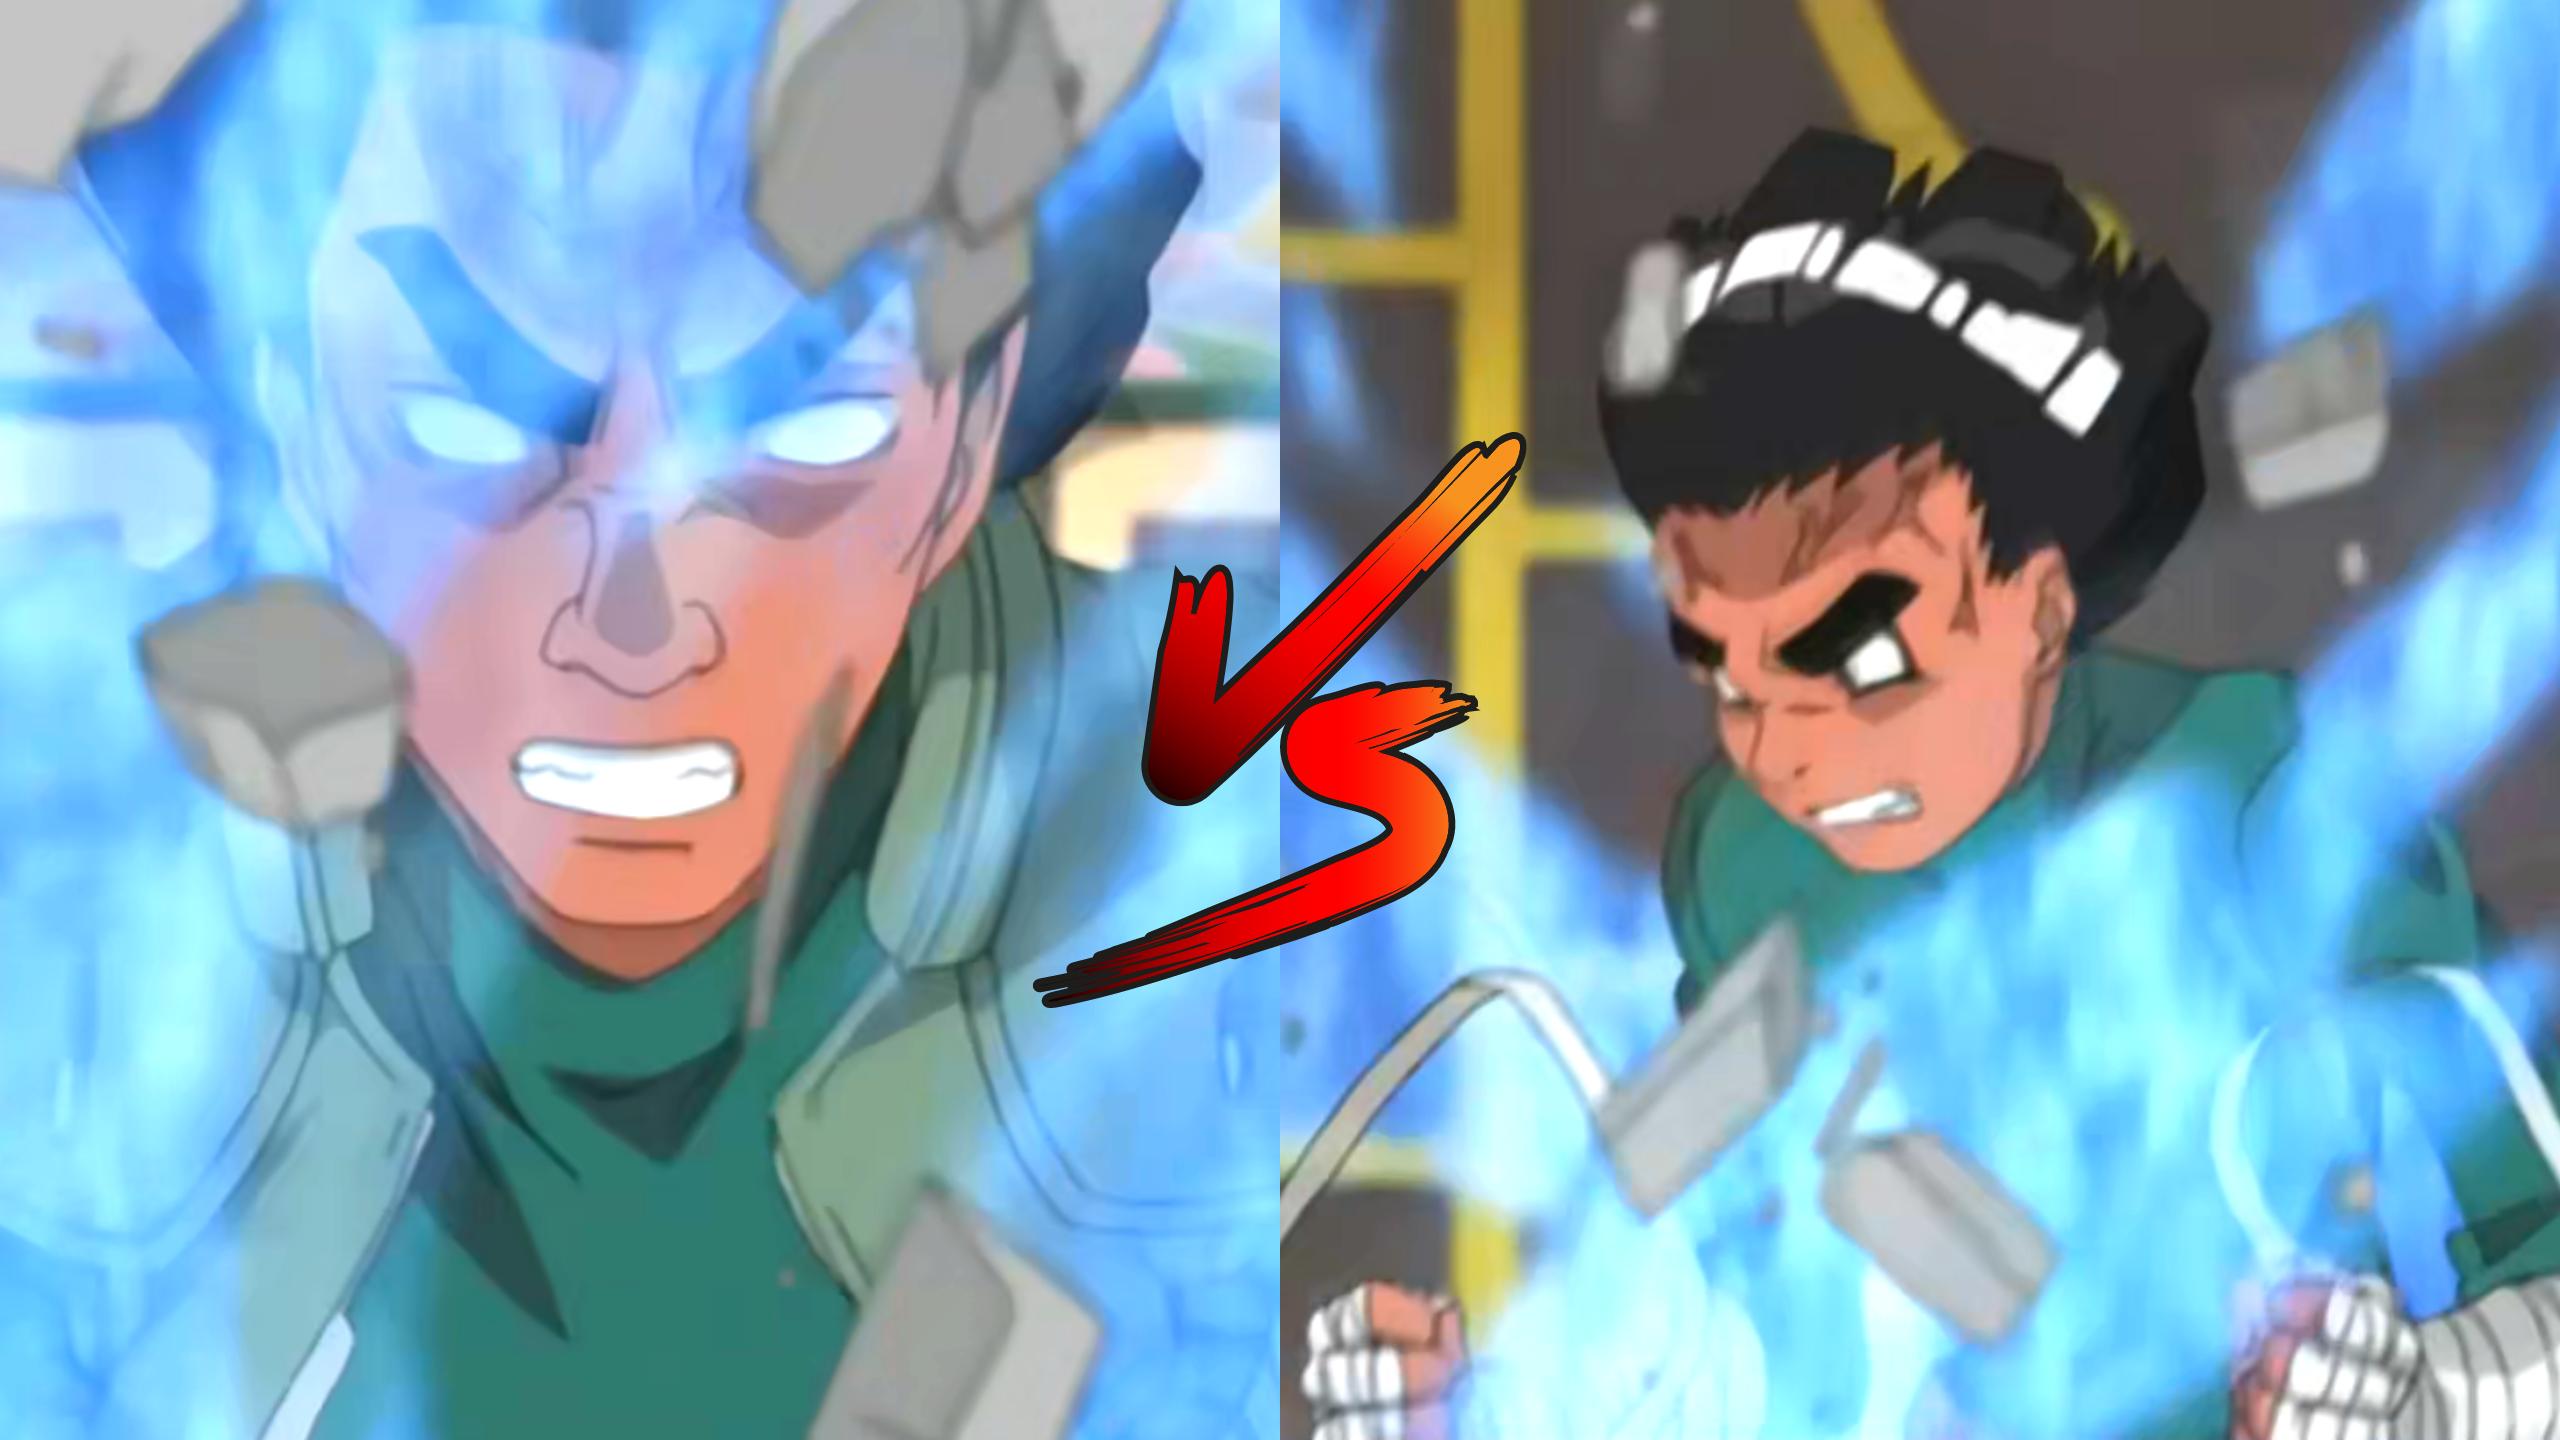 naruto - guy sensei vs rock lee - ayedot